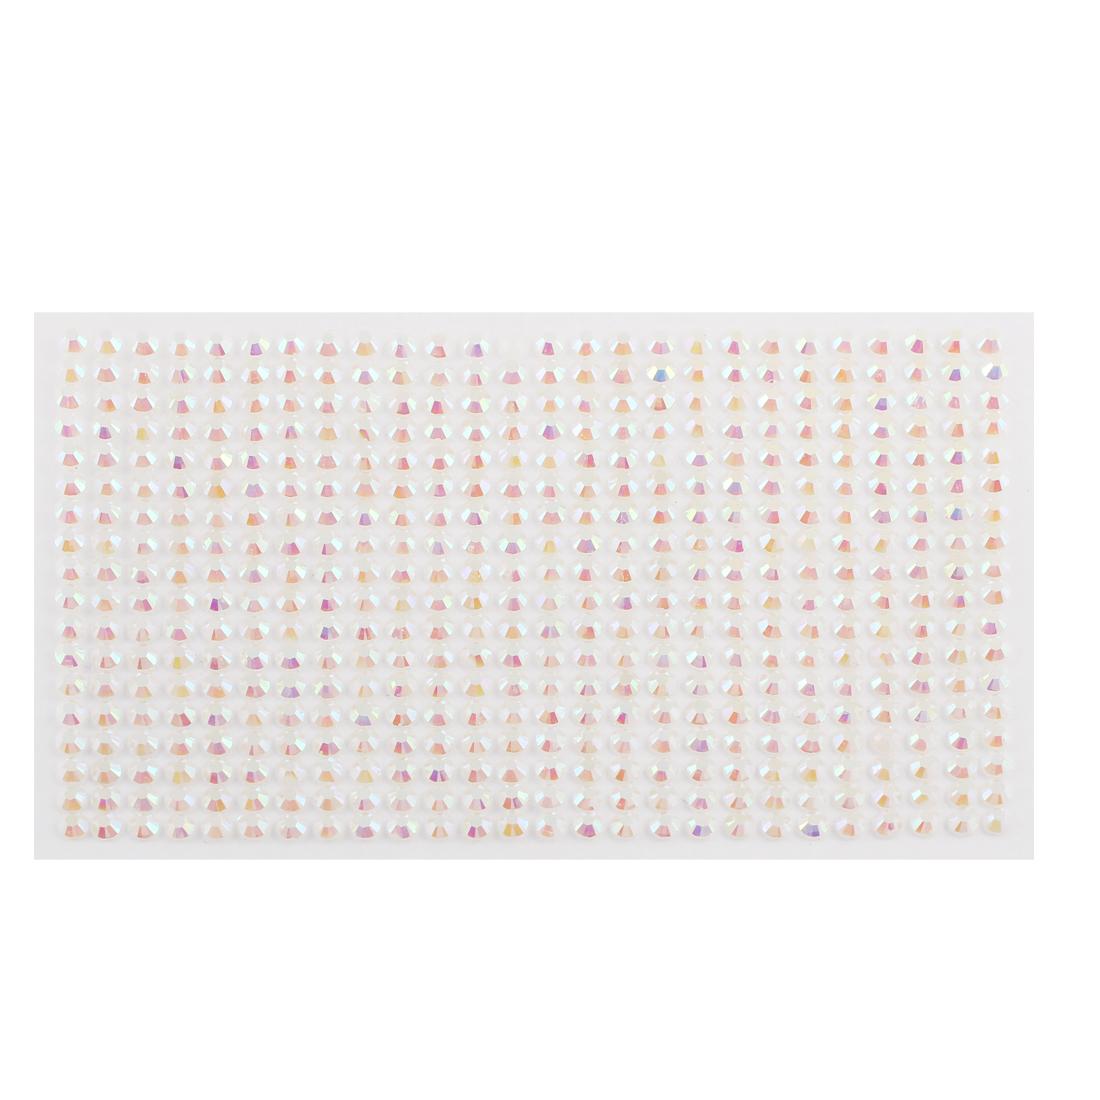 White 5mm Round Self Adhesive Sparkly Crystal Rhinestone DIY Stickers